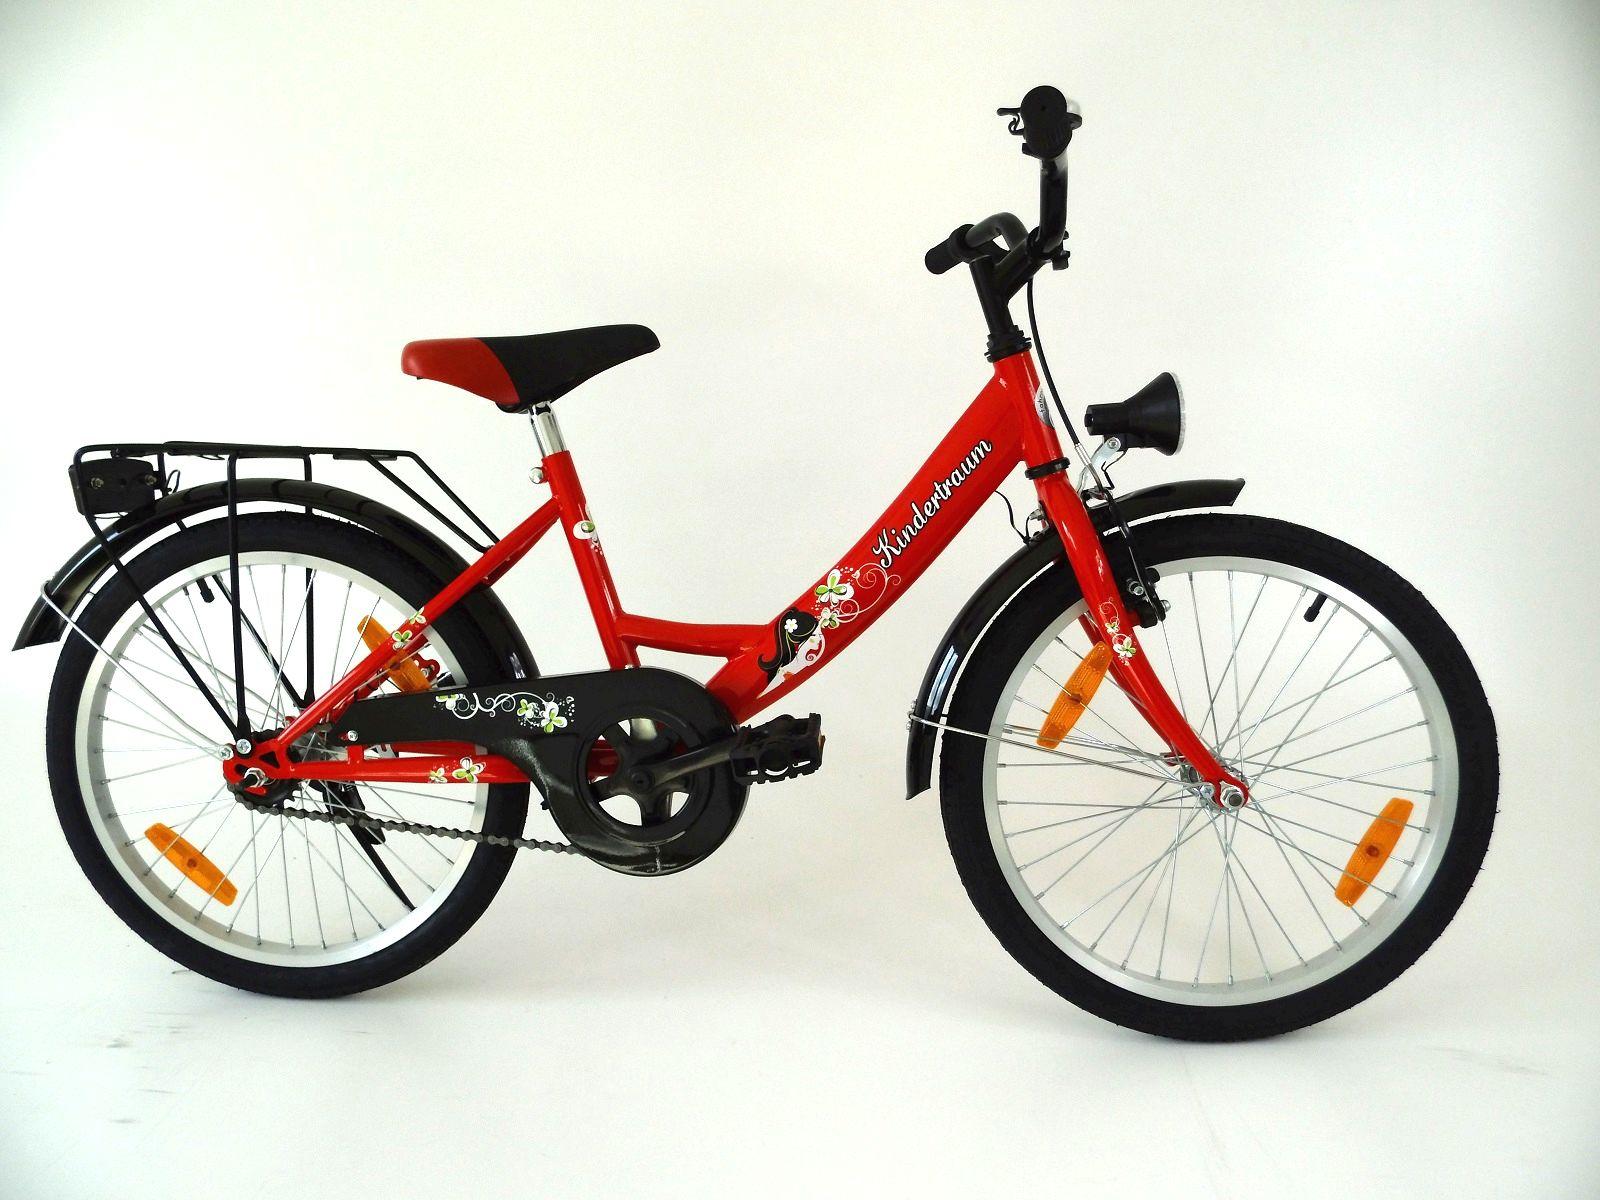 neu 20 zoll kinderfahrrad kinderrad fahrrad rad. Black Bedroom Furniture Sets. Home Design Ideas